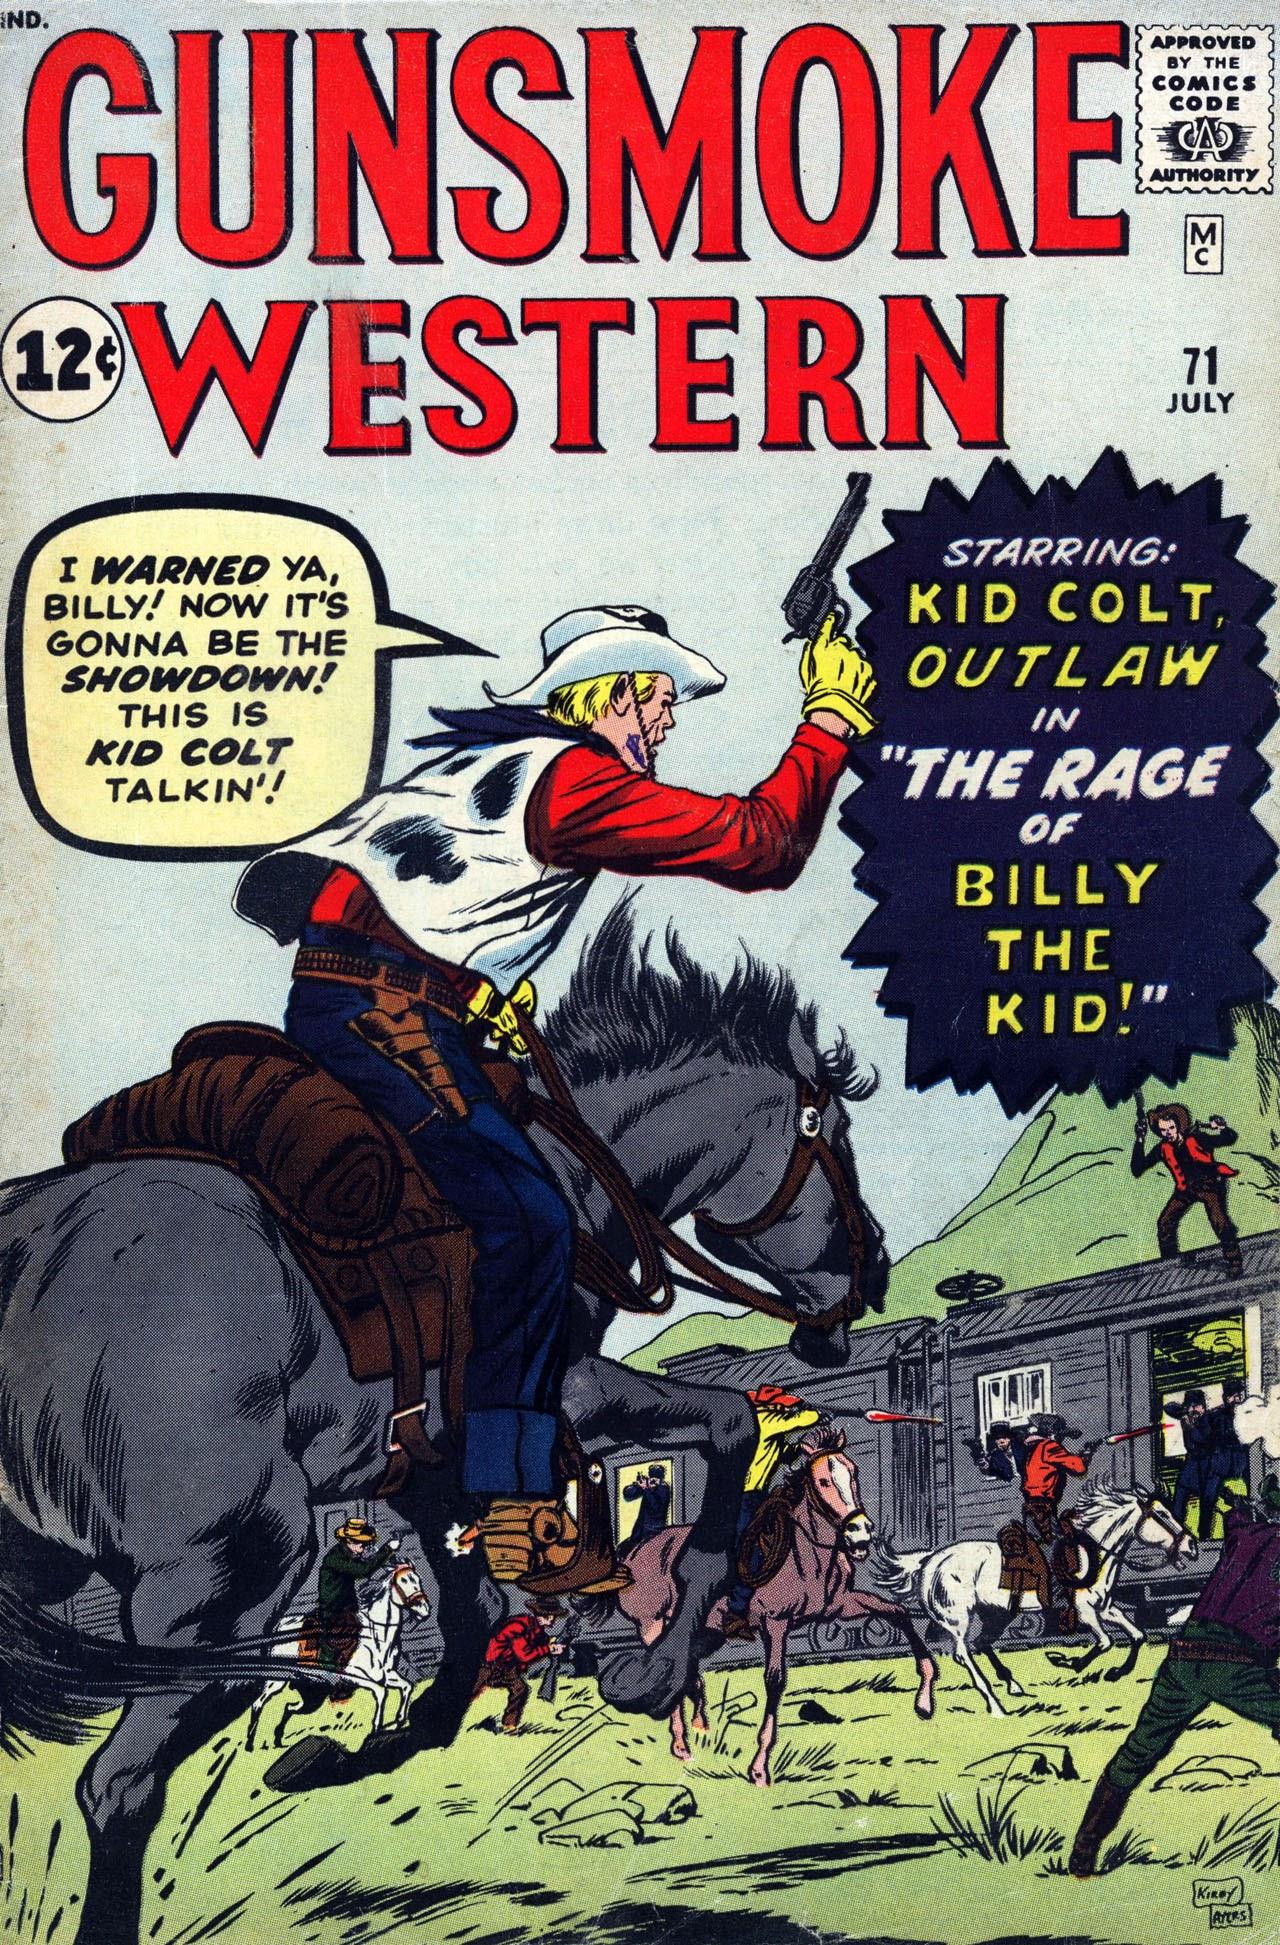 Gunsmoke Western 71 Page 1